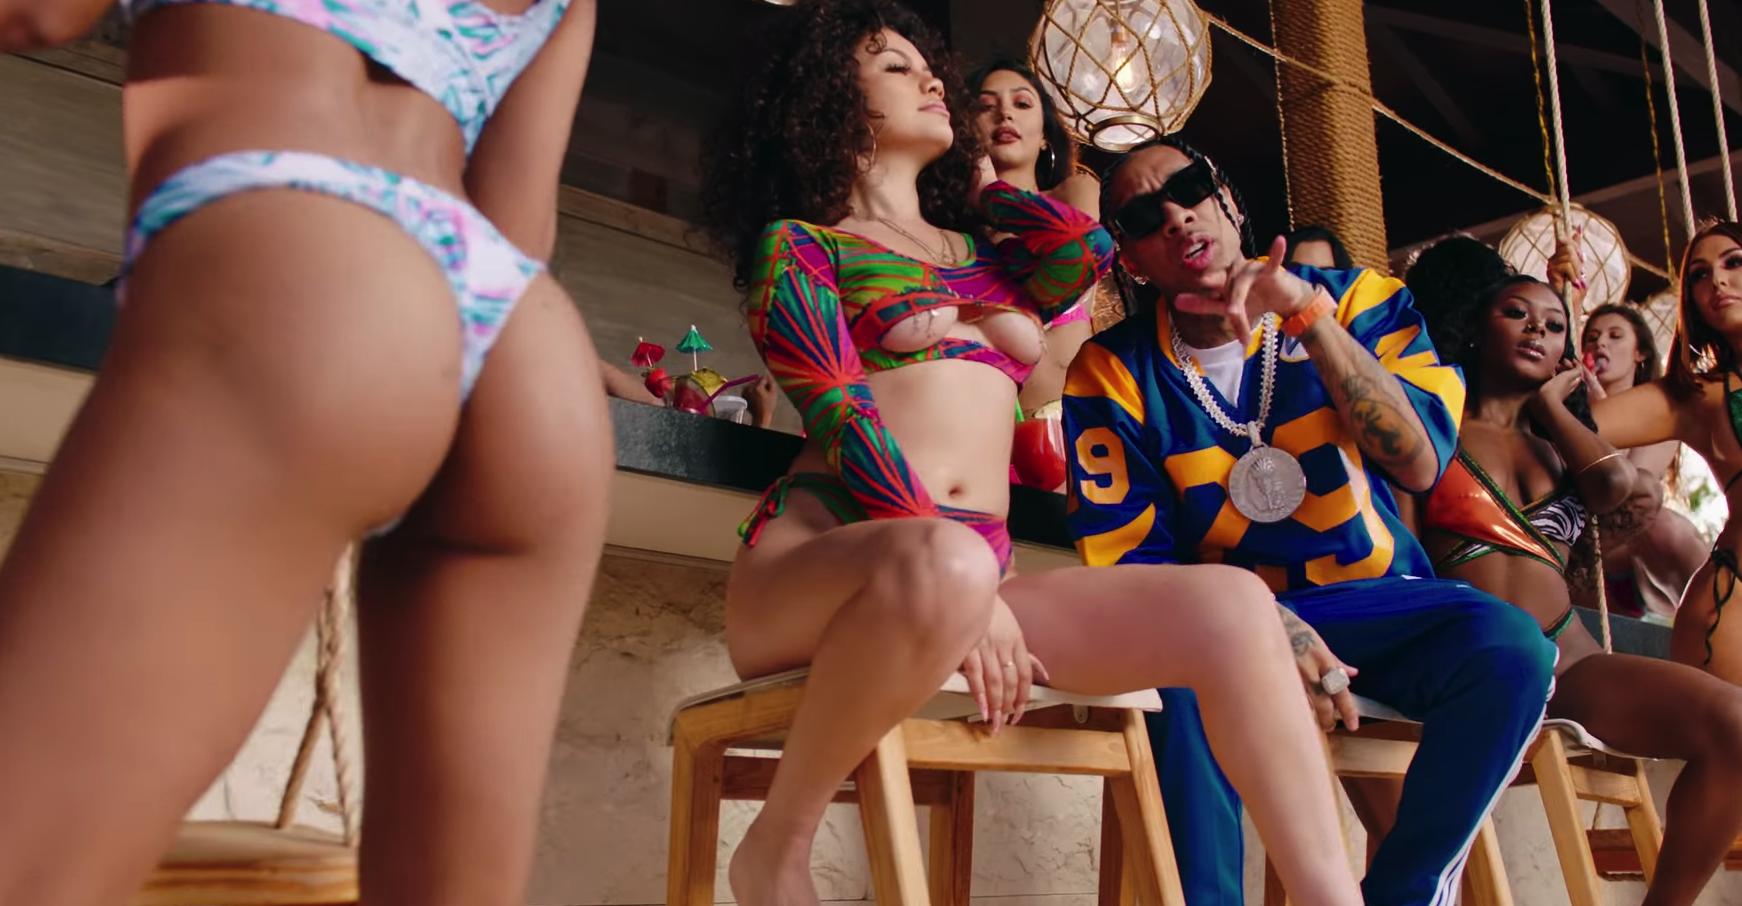 Tyga feat. G-Eazy & Rich The Kid - Girls Have Fun (Video) |16BARS.DE